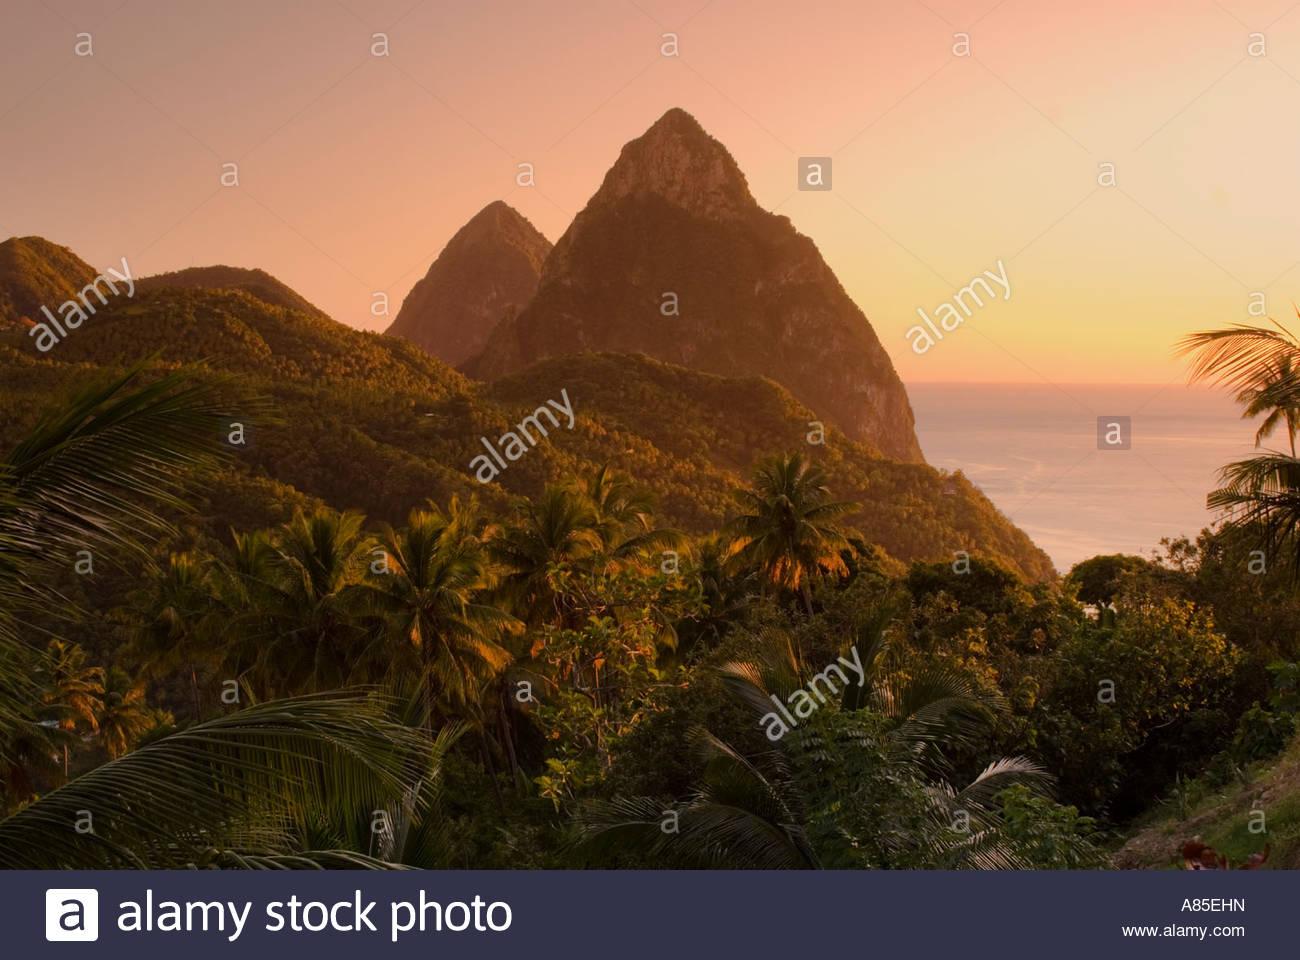 Die pitons, St Lucia, Windward Islands, Karibik. Stockbild